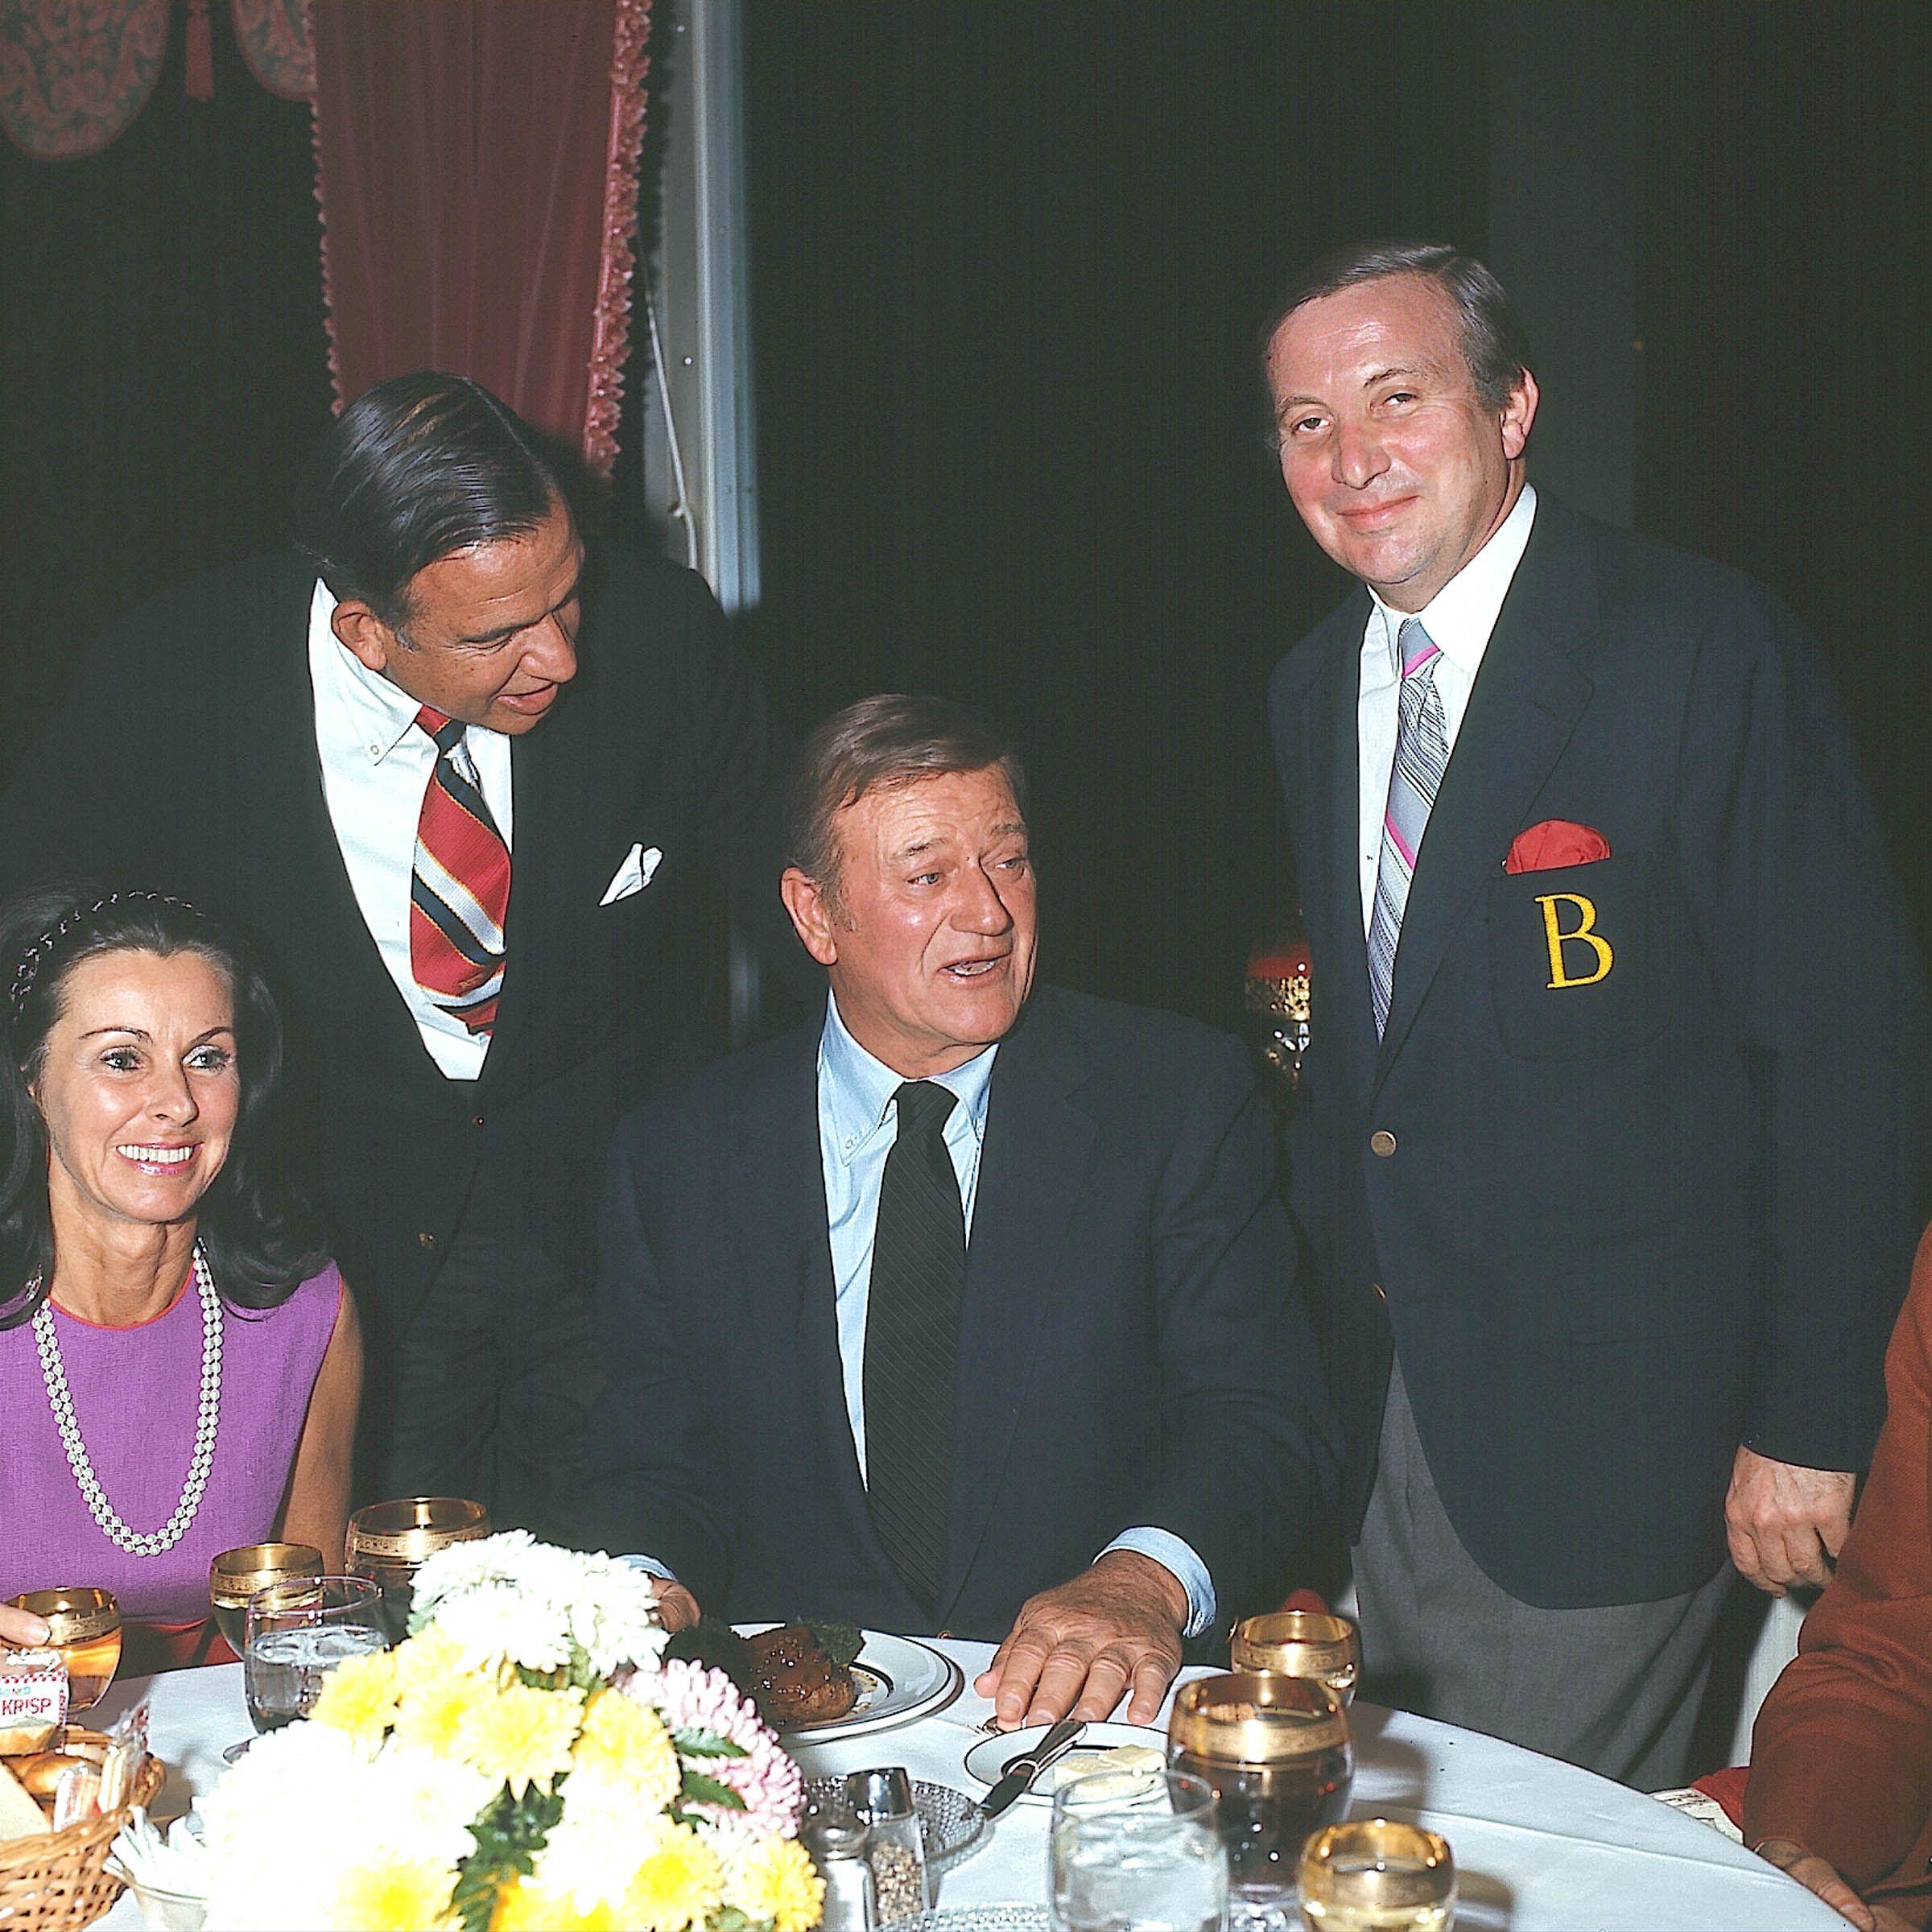 John Wayne Samples Continental Cuisine In The Penrose Room